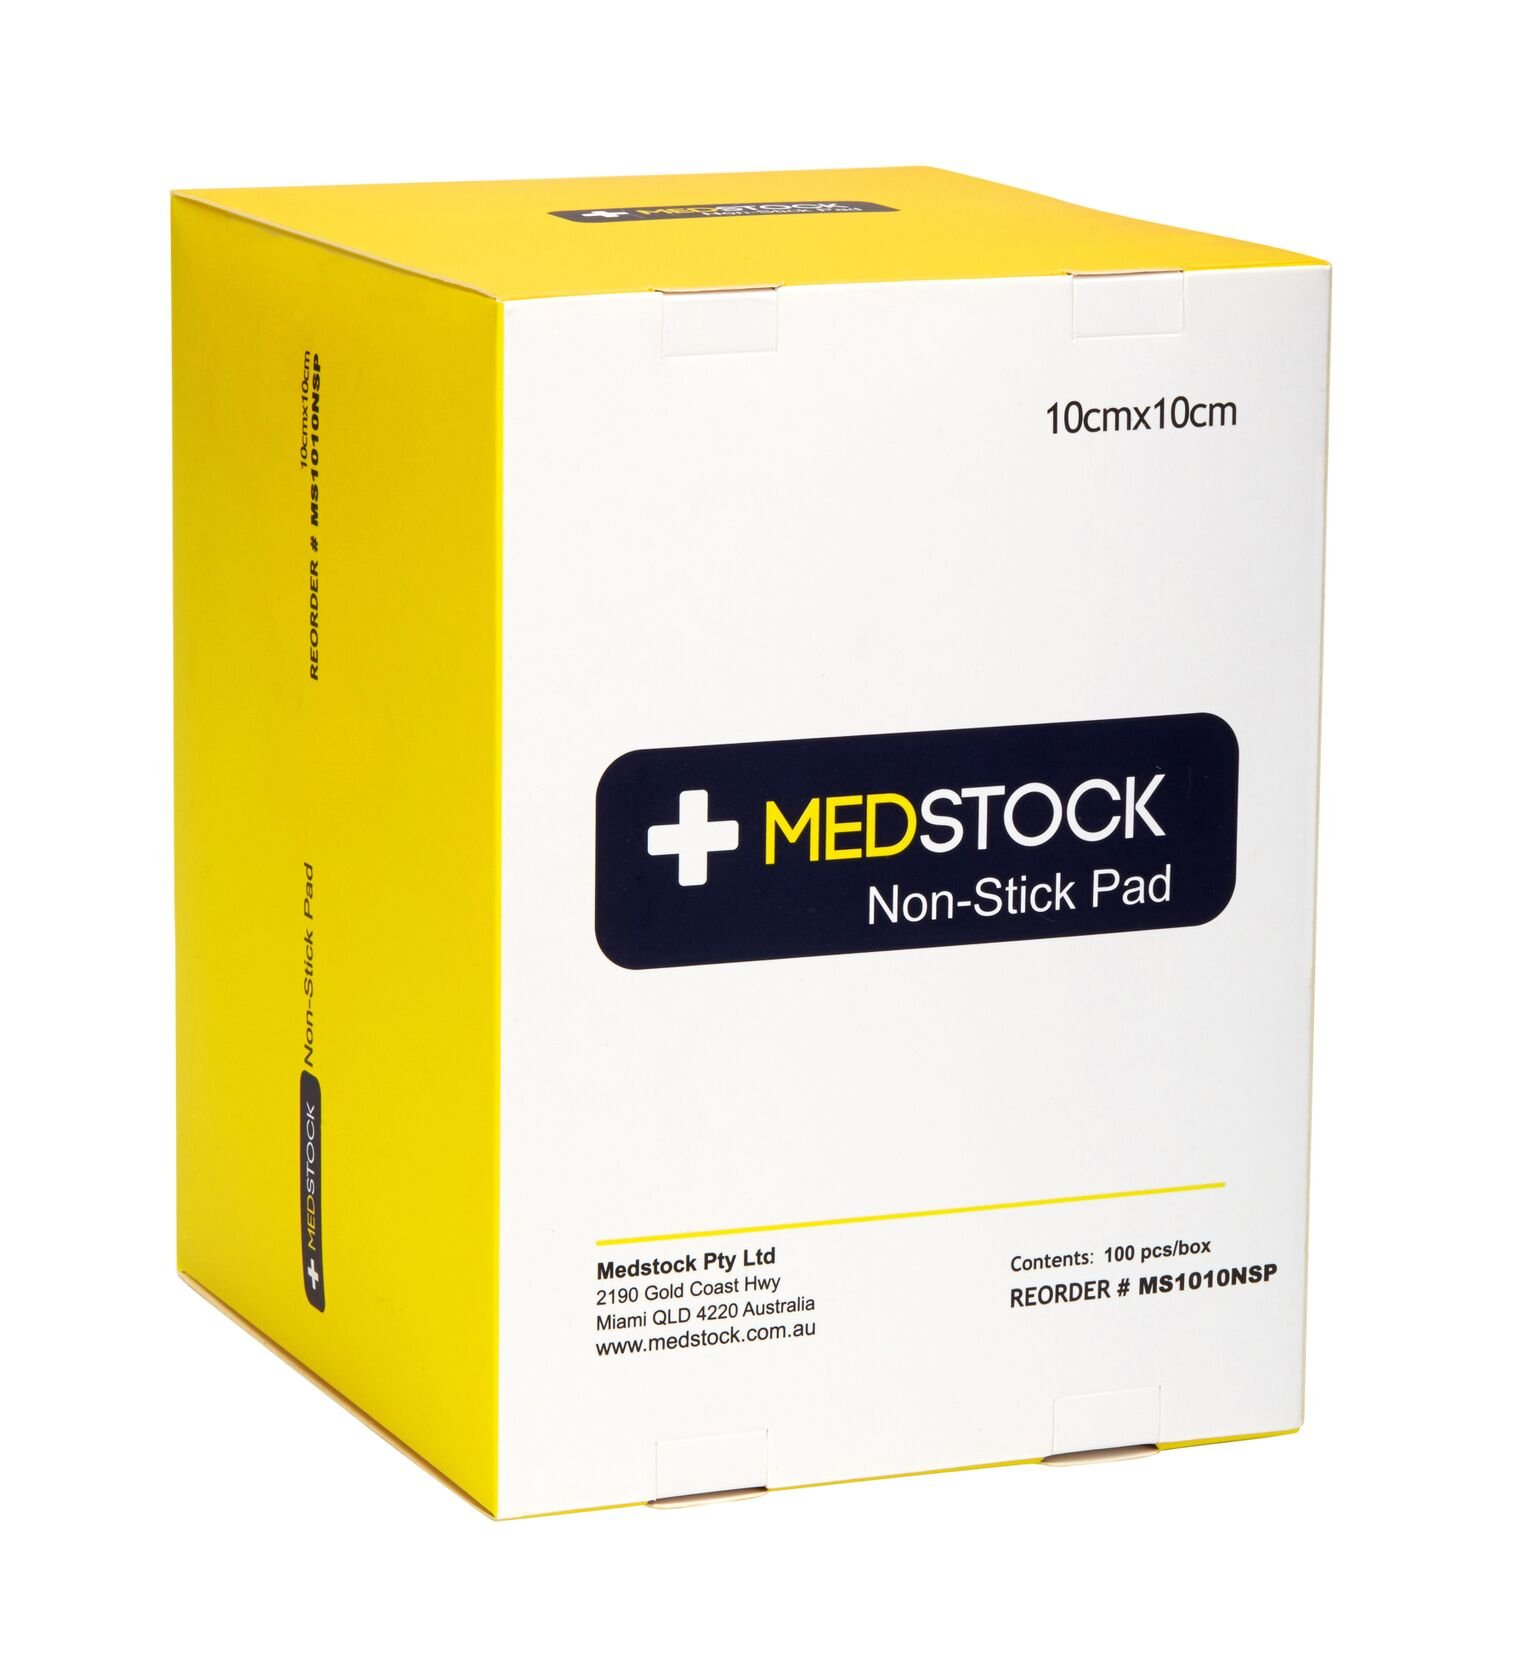 MEDSTOCK NON-STICK PAD 10CM X 10CM BOX 100